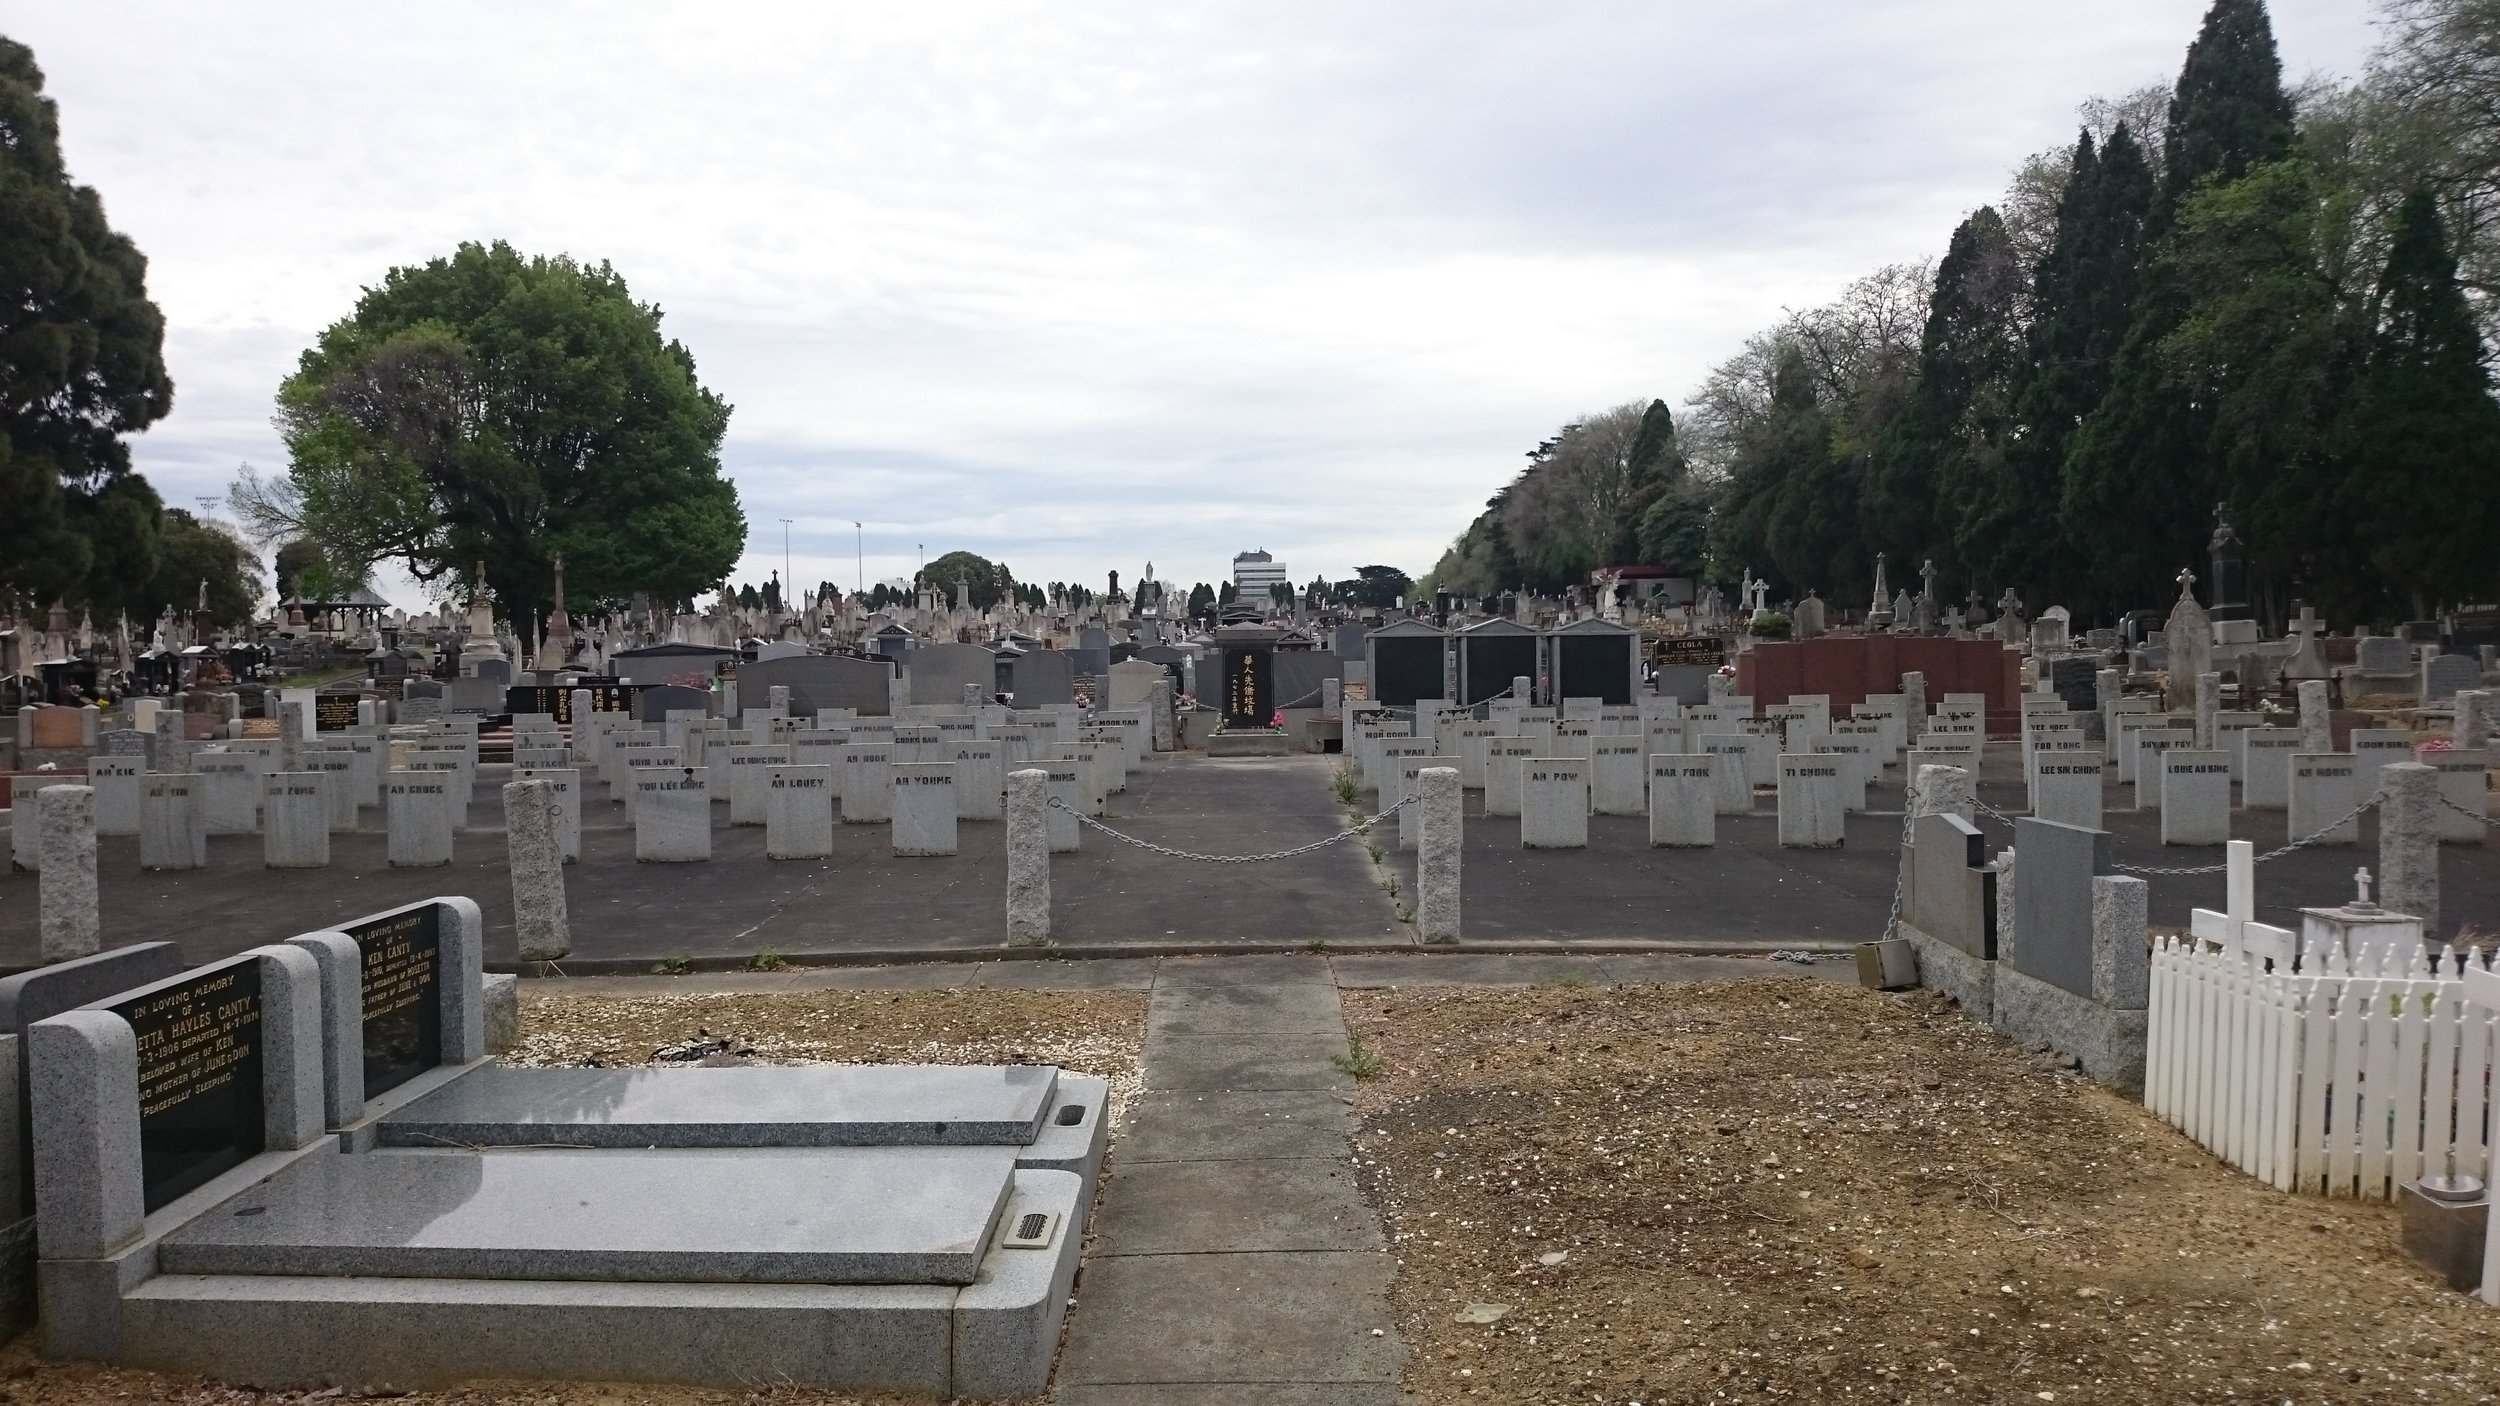 The memorial site.